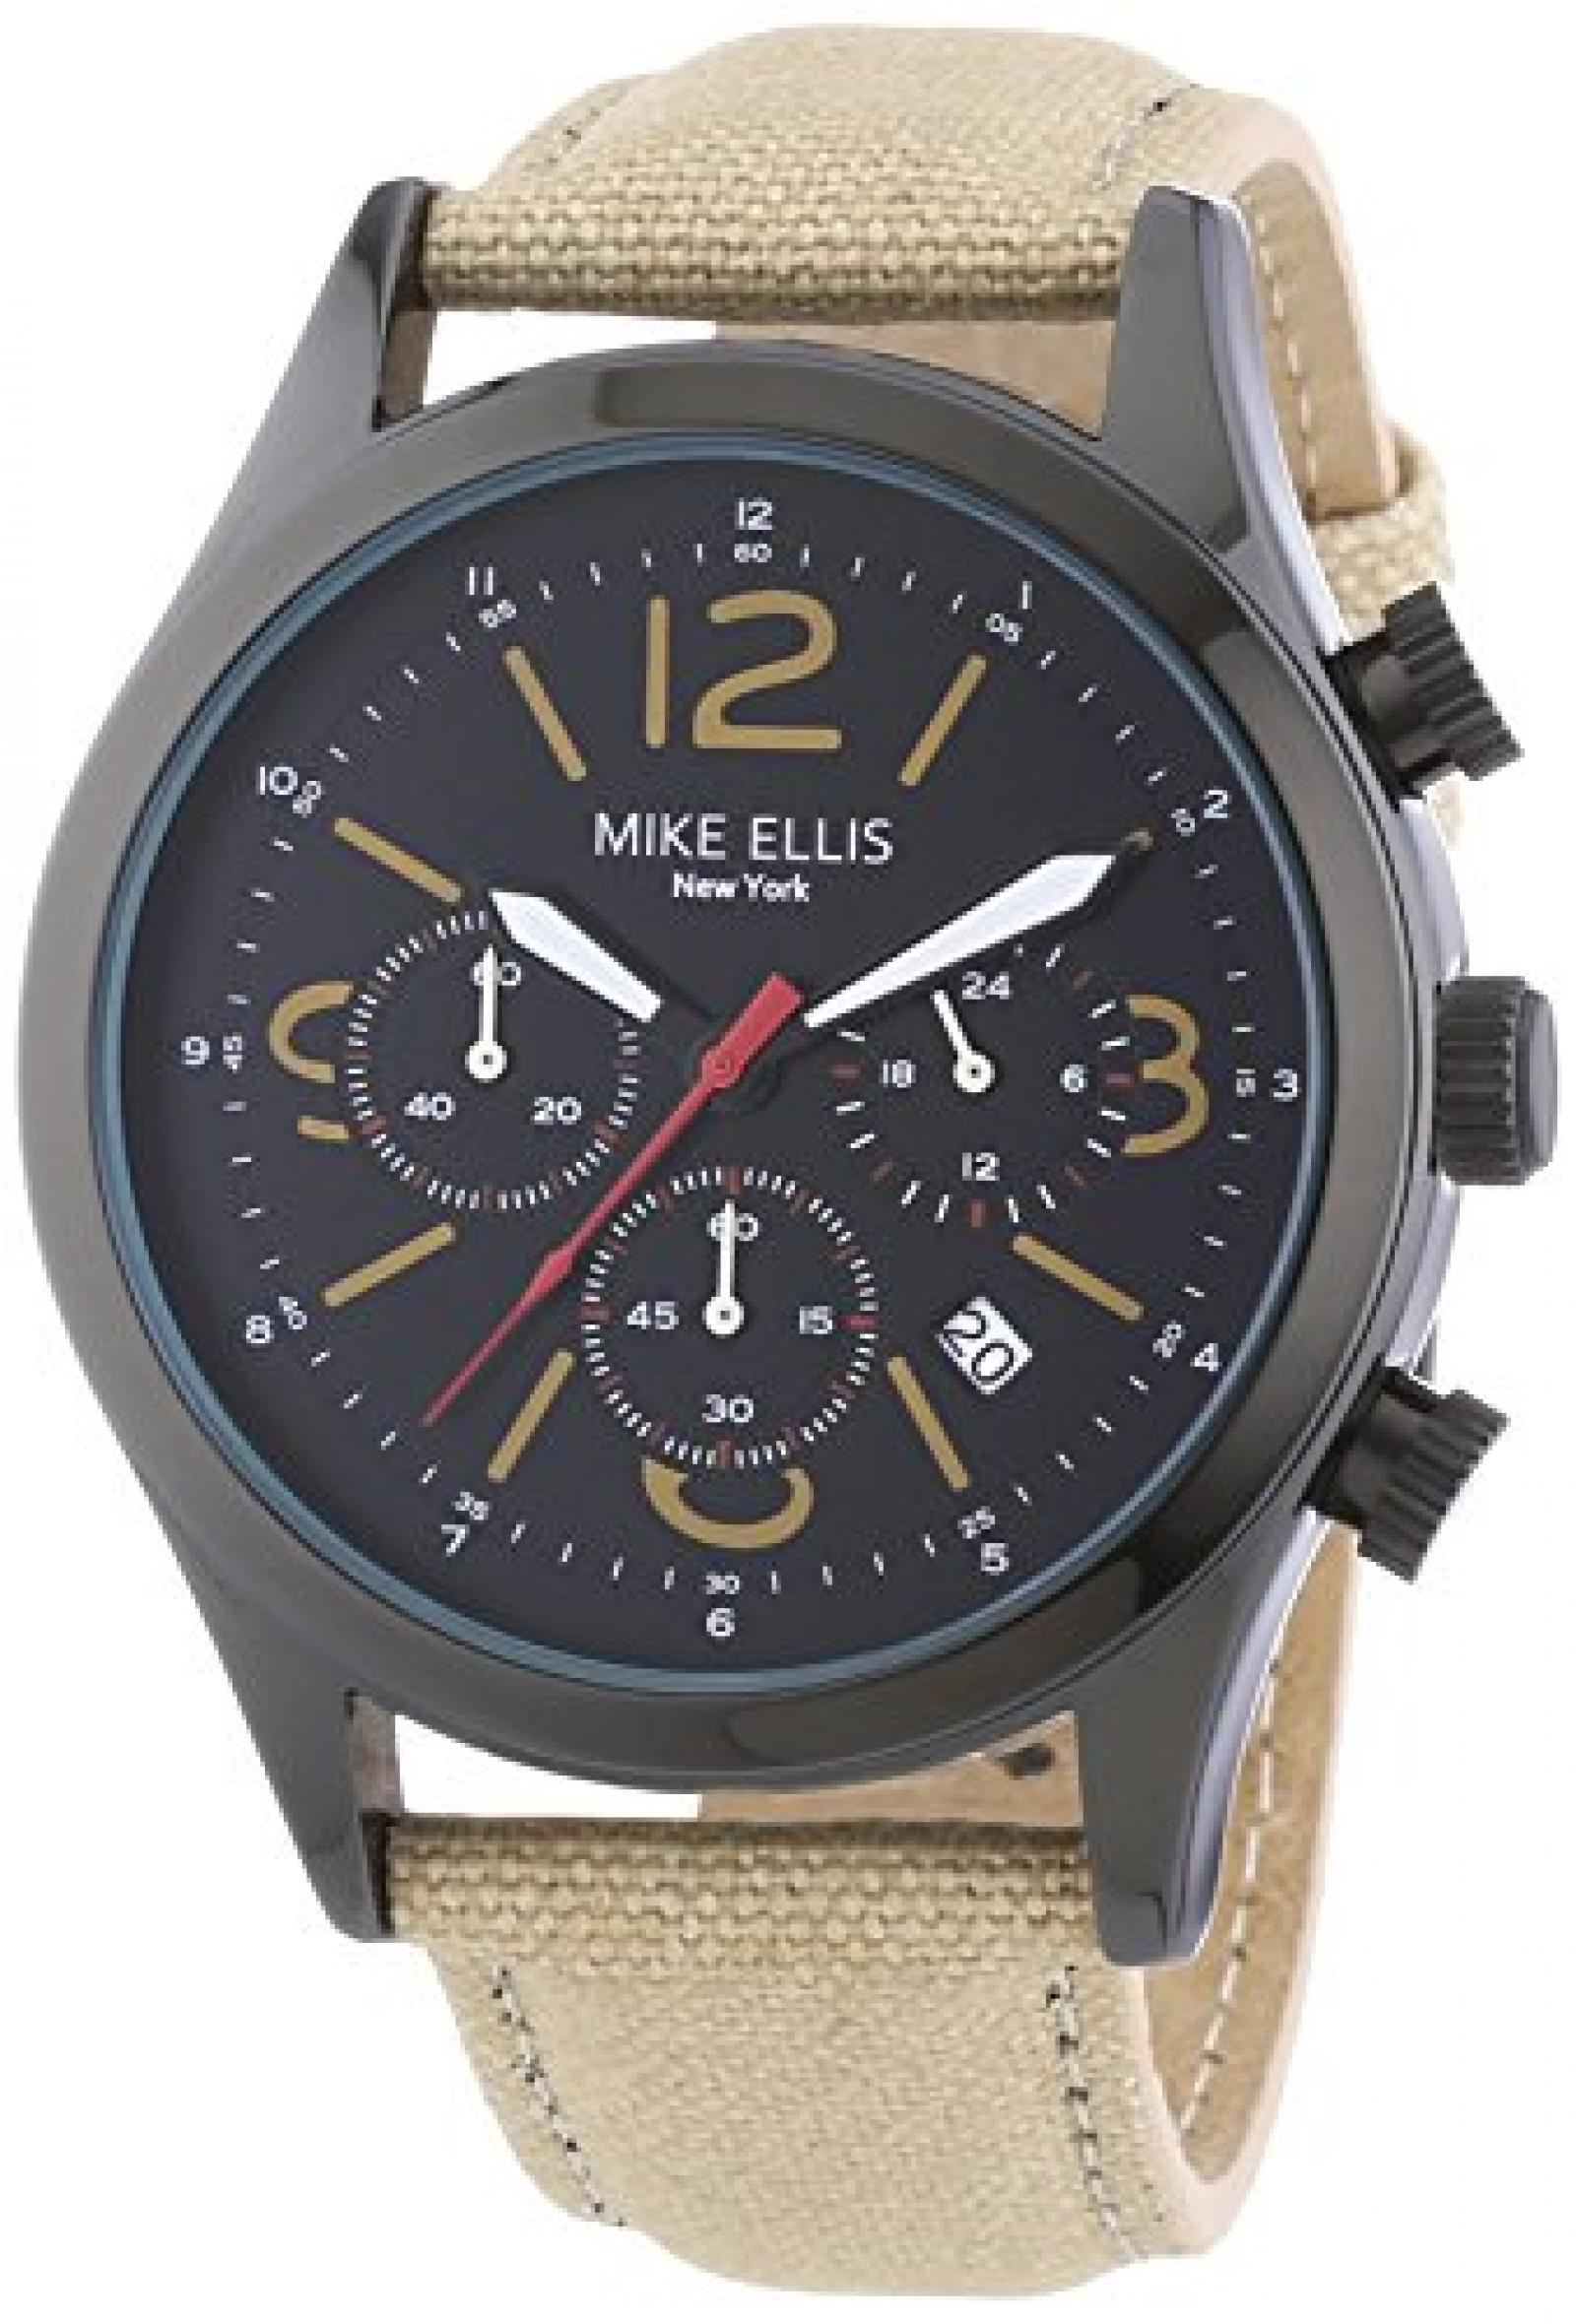 Mike Ellis New York Herren-Armbanduhr XL Desert Fox Chronograph Quarz Textil M2439B